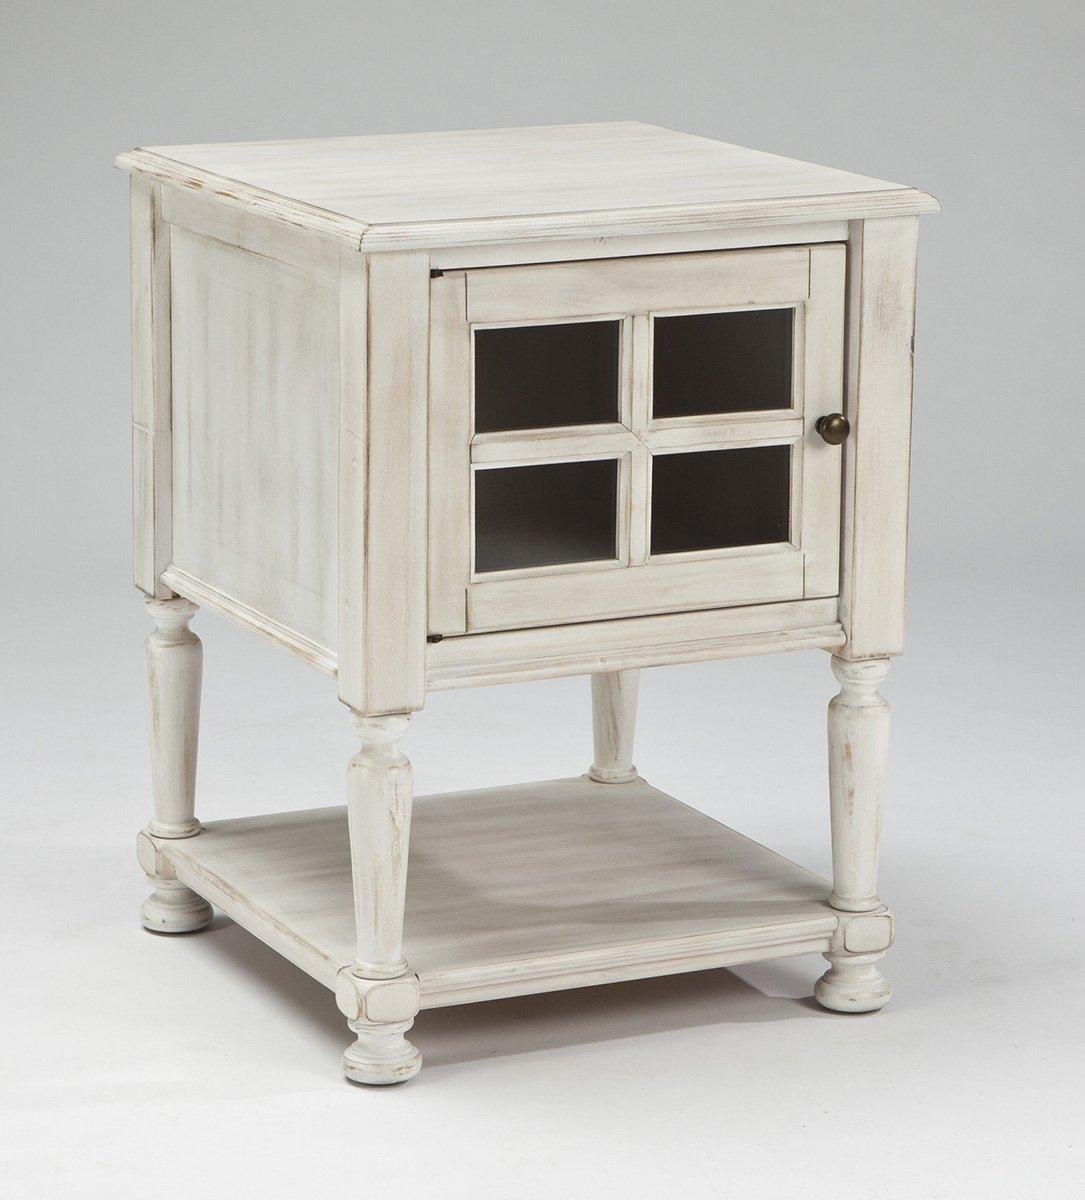 Distressed White End Tables Decor Ideasdecor Ideas